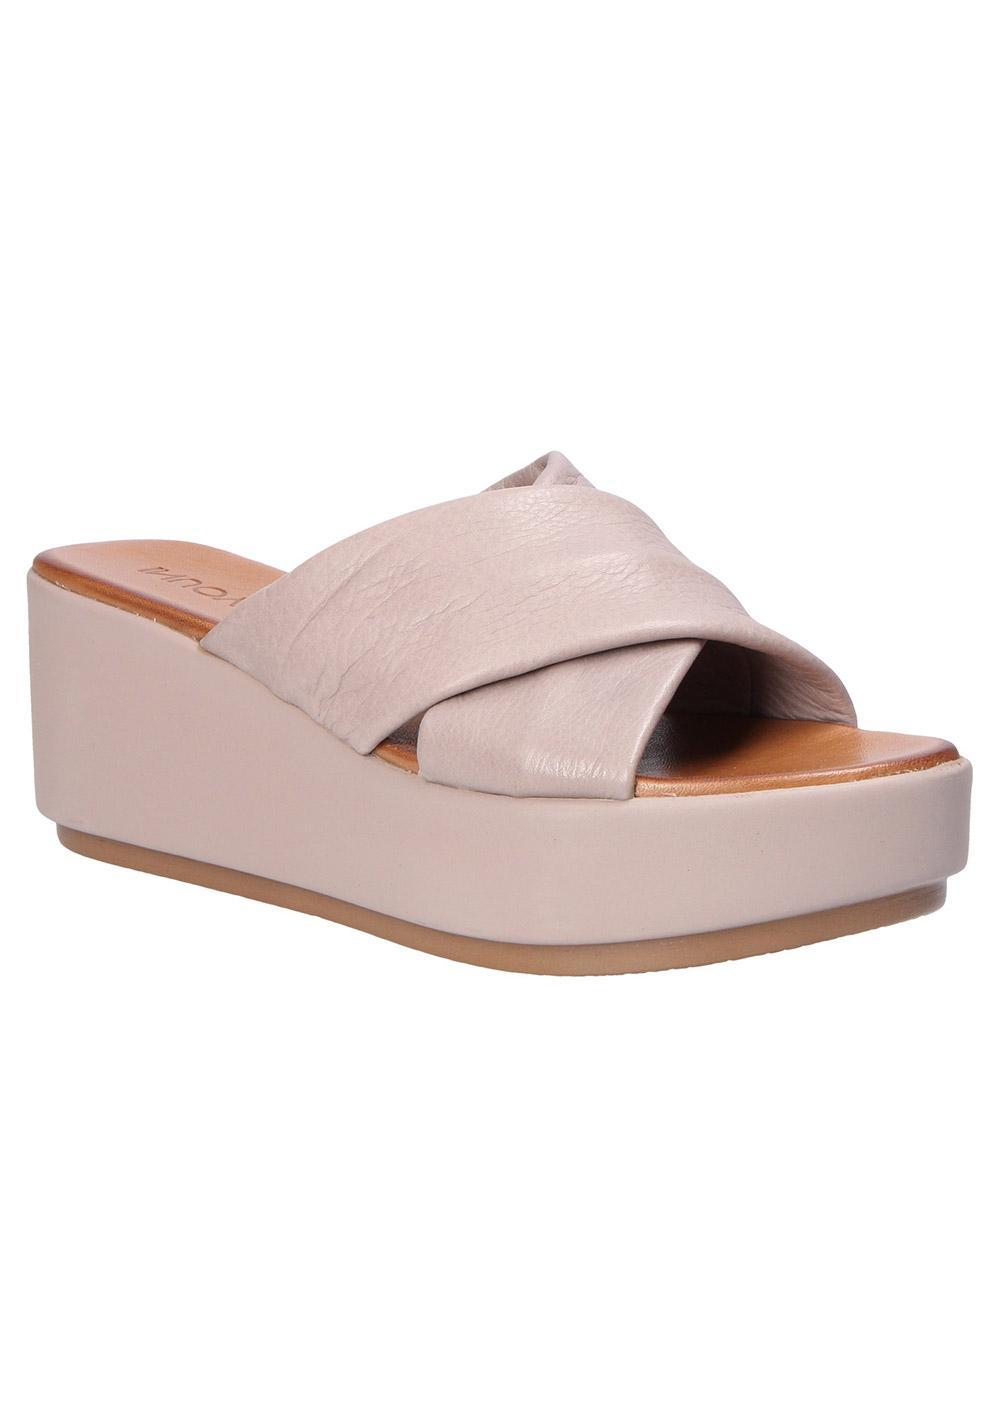 sale retailer 08e3d 6bd79 w) Sandale Inuovo 123001 - Größe: 39 - Farbe: Rosa